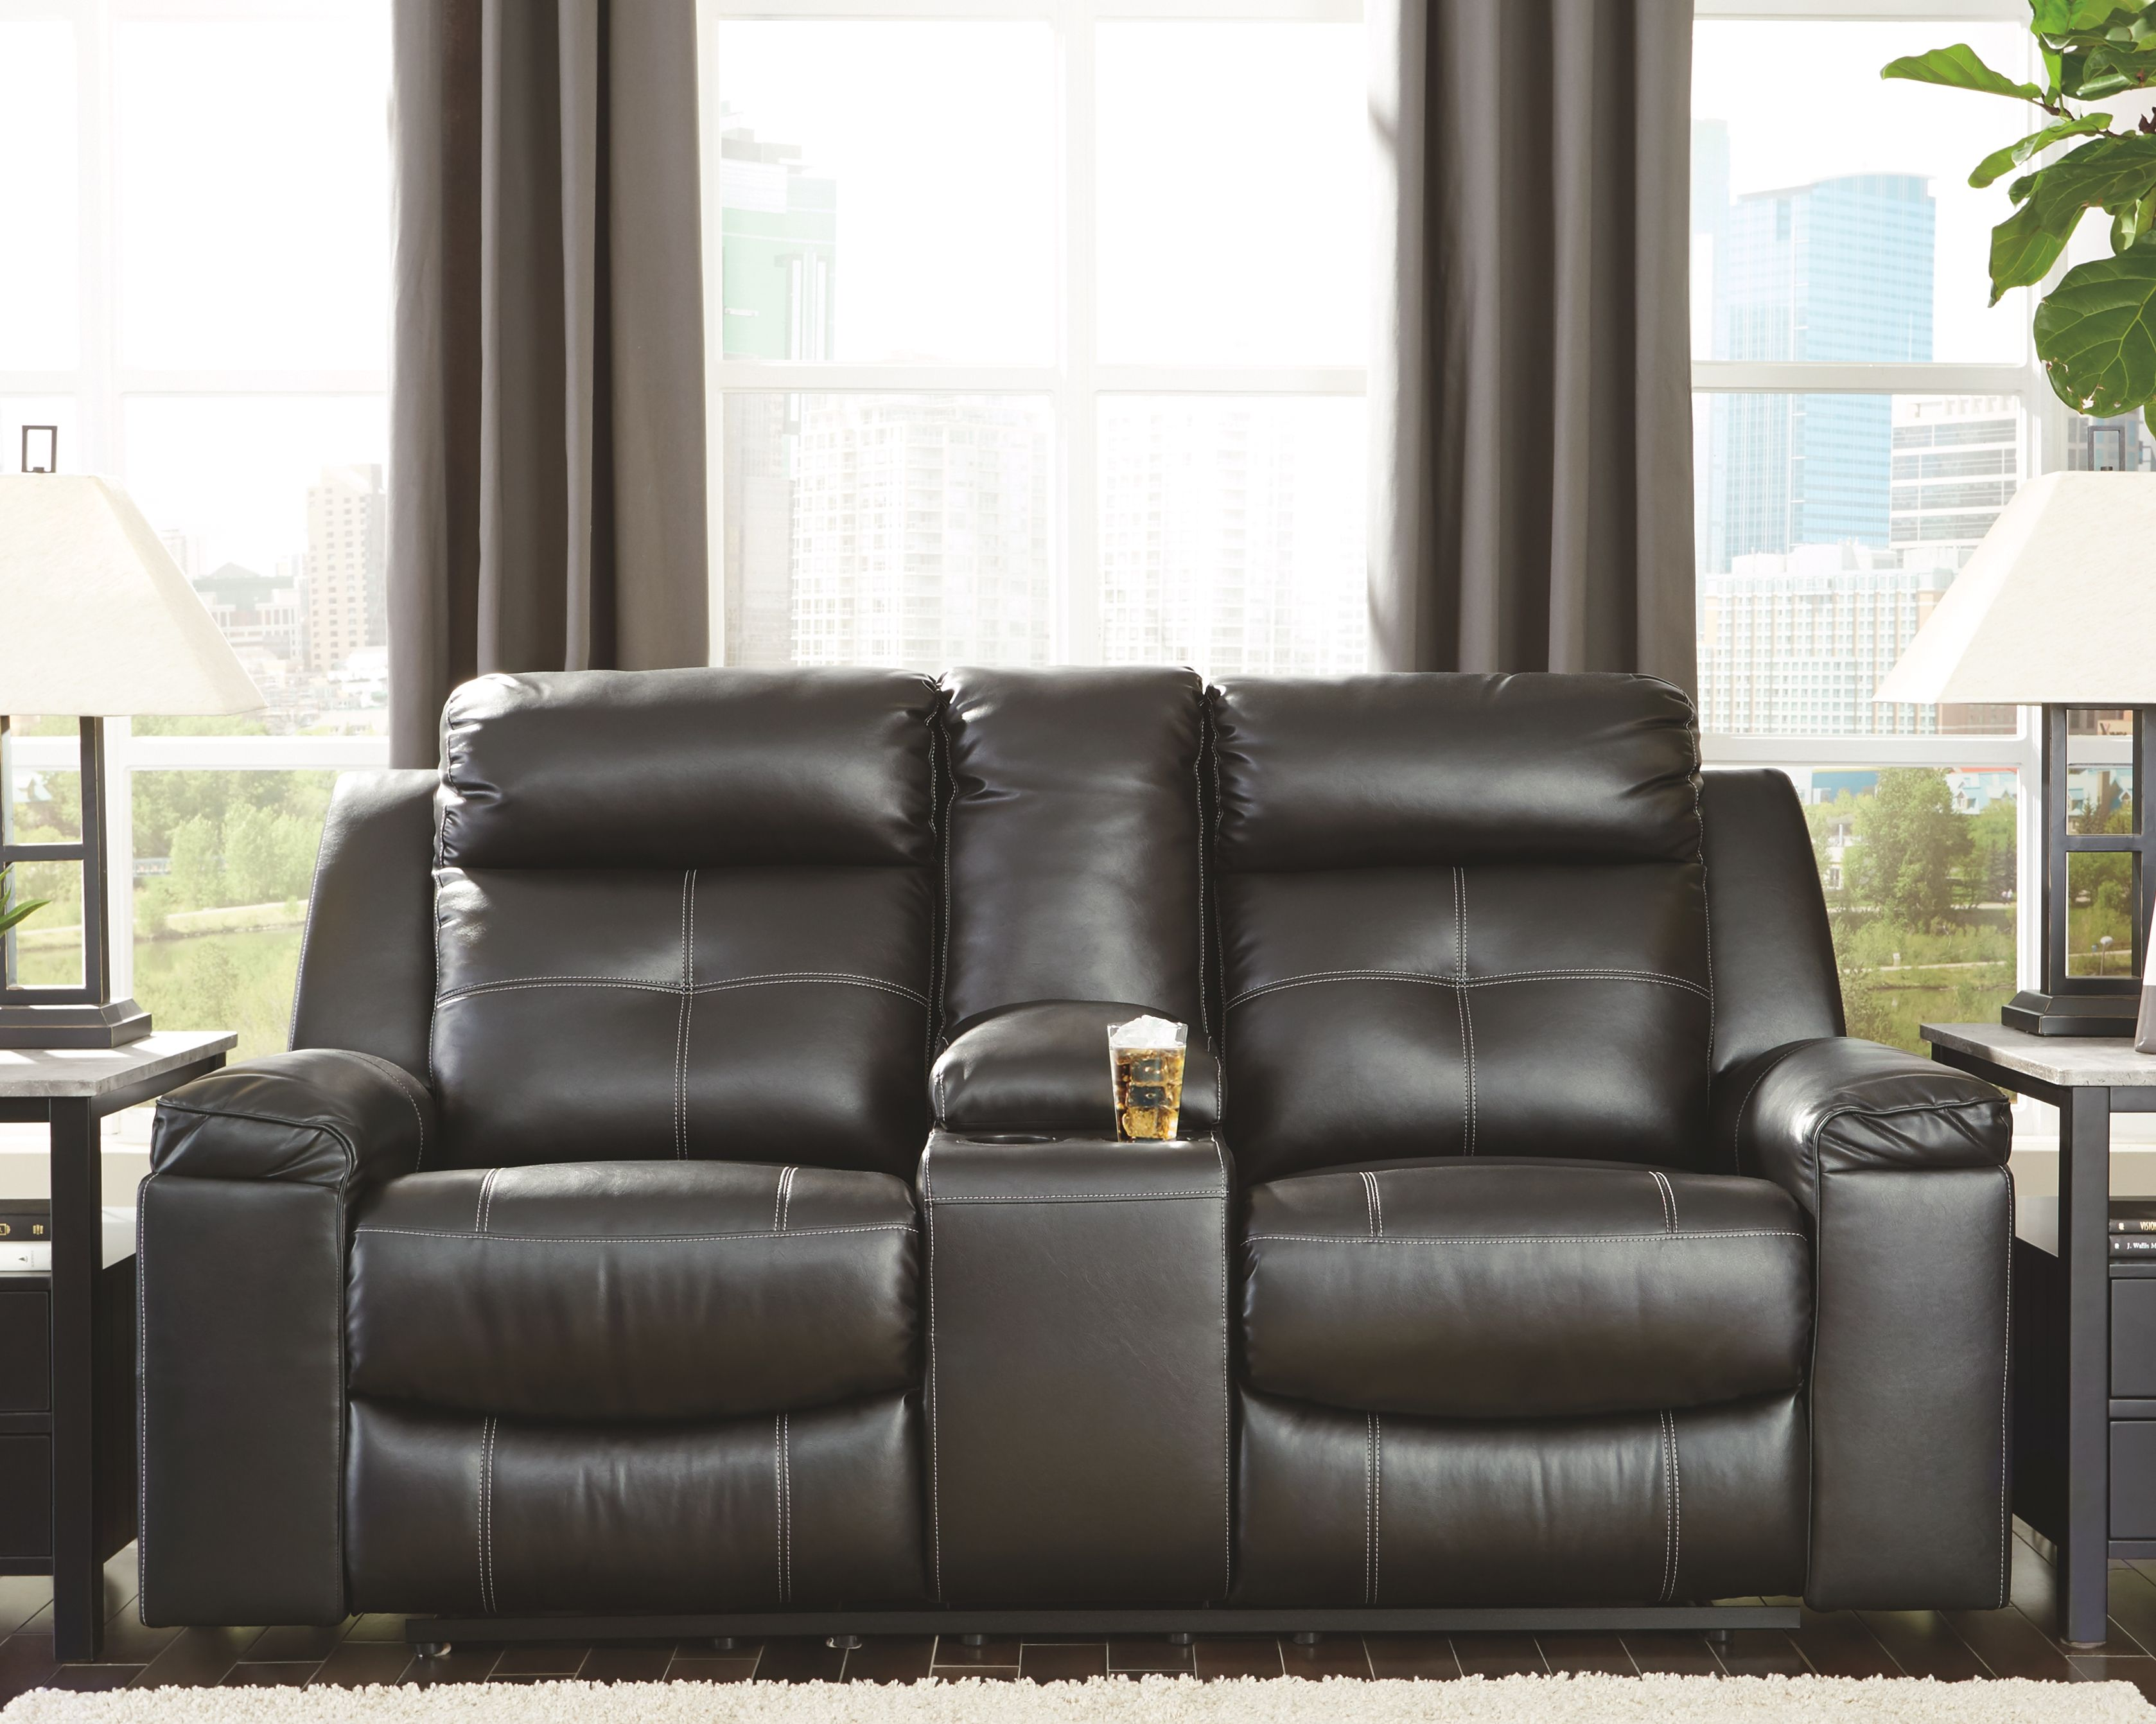 Groovy Kempten Reclining Loveseat With Console Black Products In Inzonedesignstudio Interior Chair Design Inzonedesignstudiocom